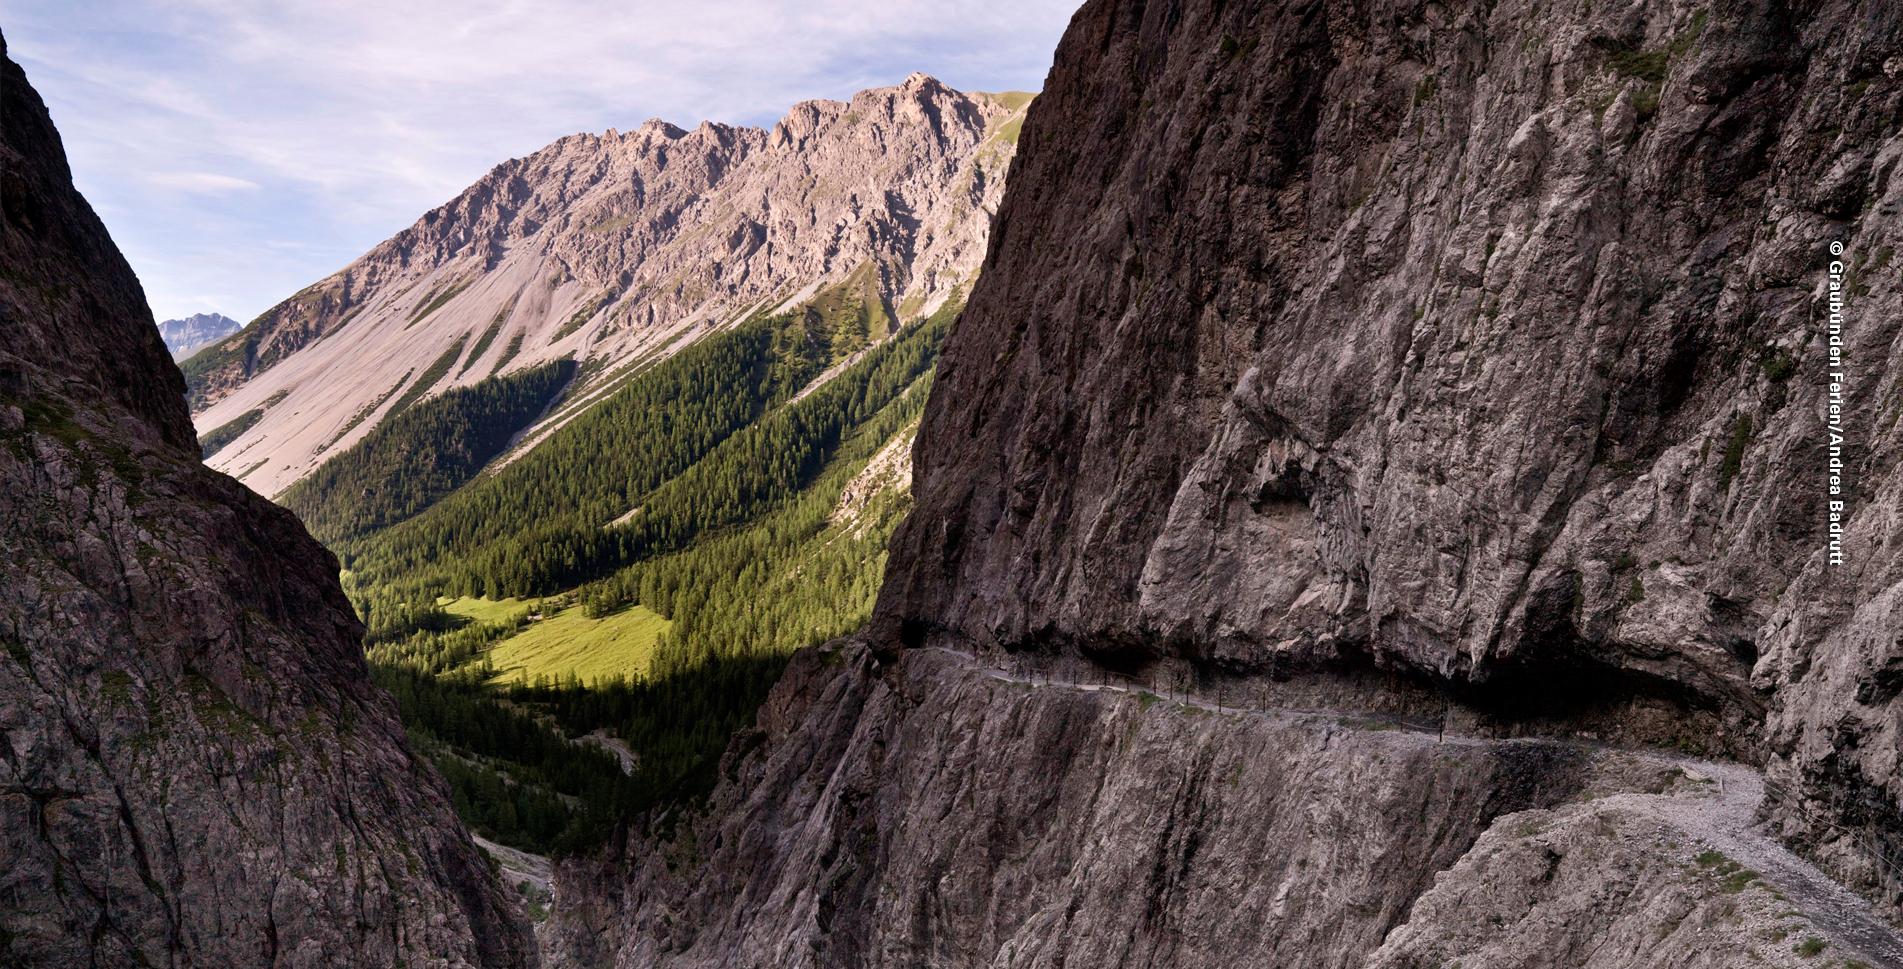 Wanderung ins Val d'Uina von S-charl bei Scoul, Unterengadin, via Val Sesvenna, Fuorcla Sesvenna, Sesvennahütte, Schlinigpass, Val d'Uina, Uina Dadaint, Uina Dadora nach Sur En